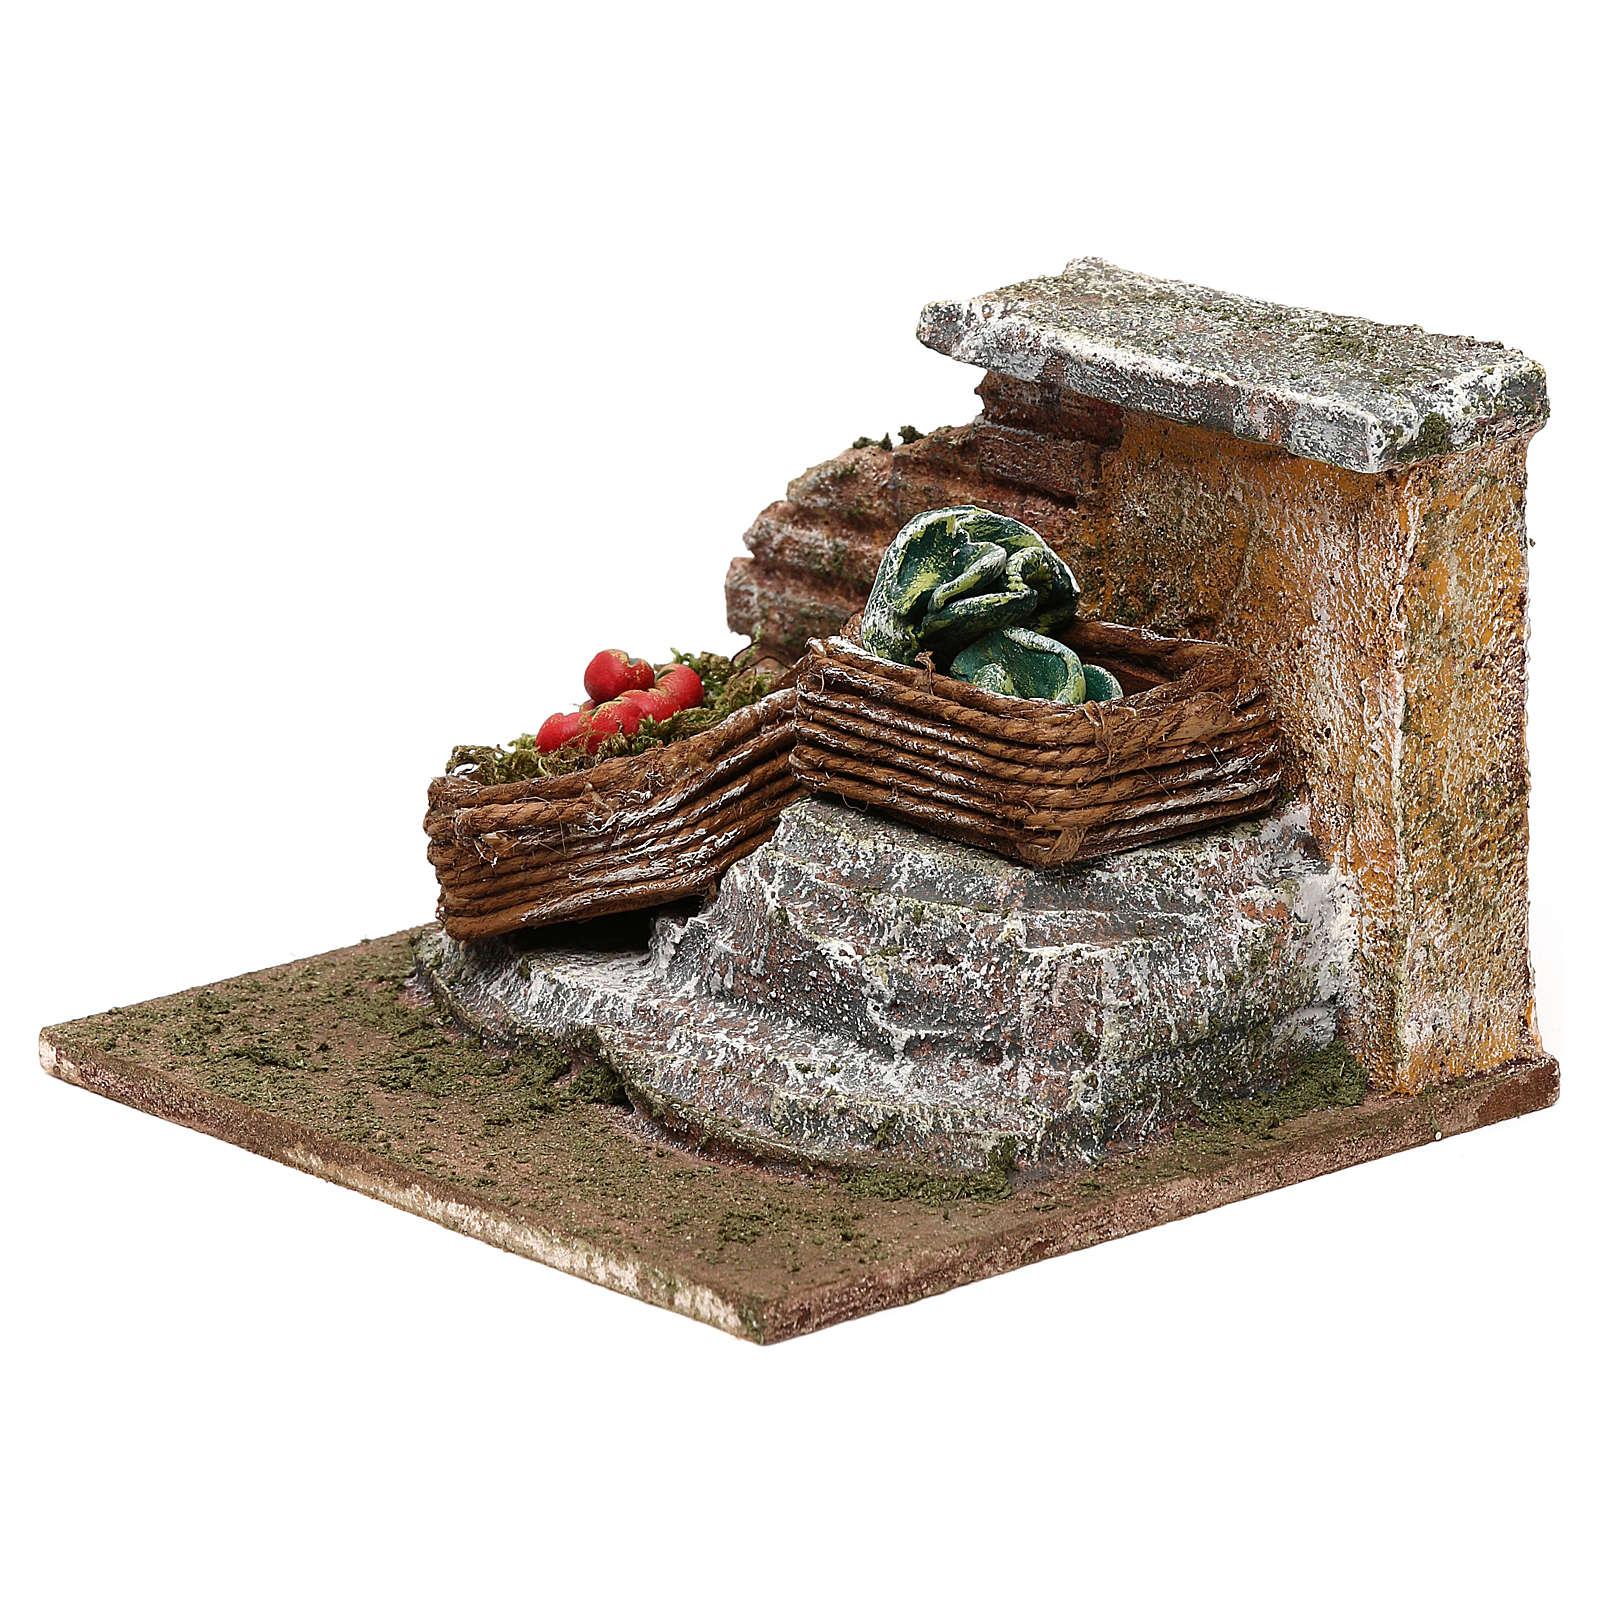 Muro con verdure presepe 12 cm ambientazione 8x12x12 cm 4